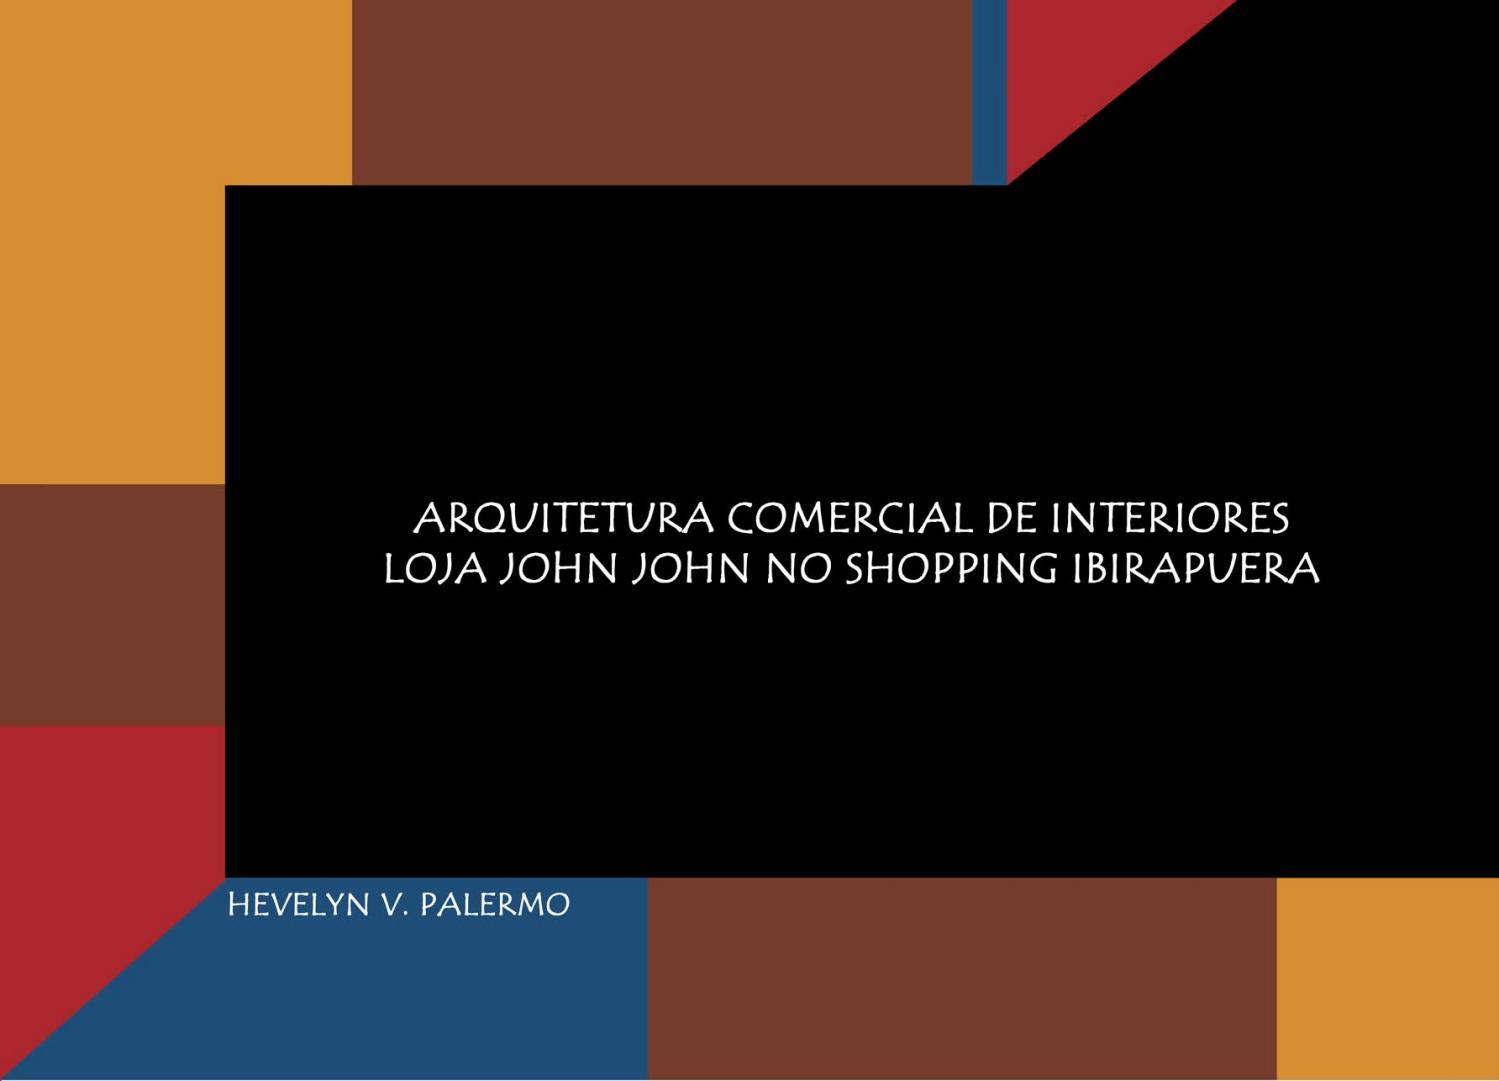 3da1986b5 Arquitetura Comercial de Interiores  Loja John John no Shopping  Ibirapuera  by Hevelyn Palermo   by Senac AU 2014 2018 - issuu